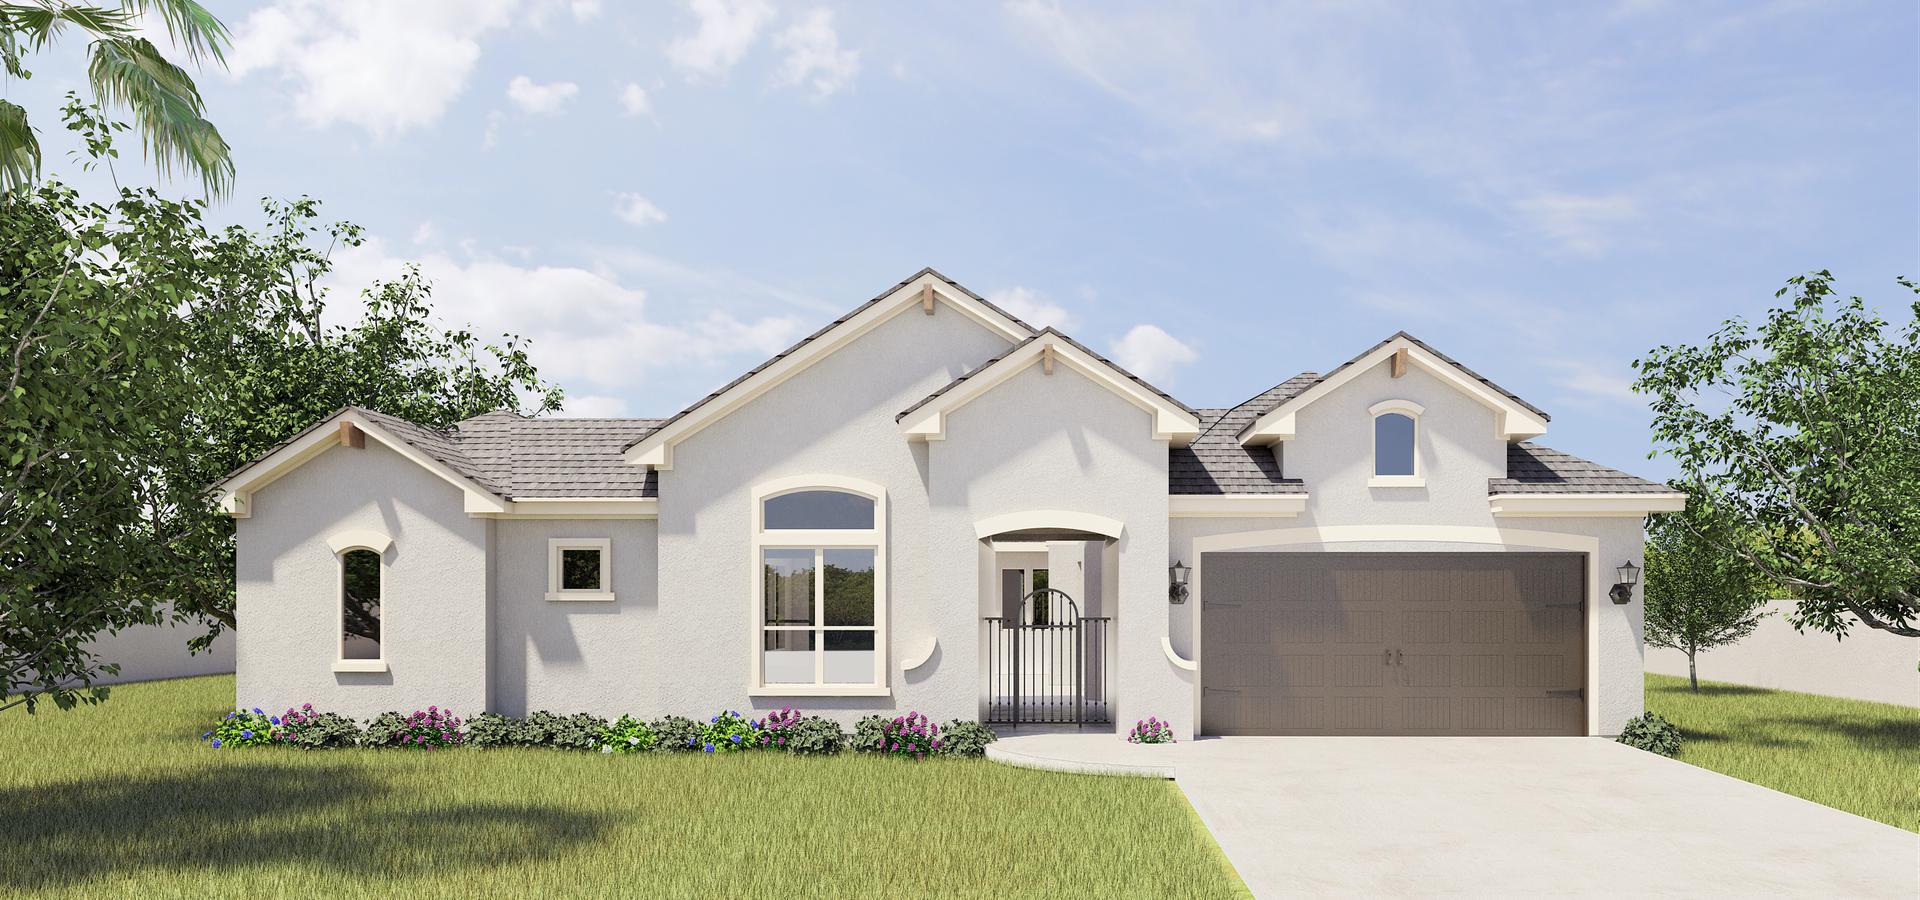 The Capistrano new home in McAllen , TX